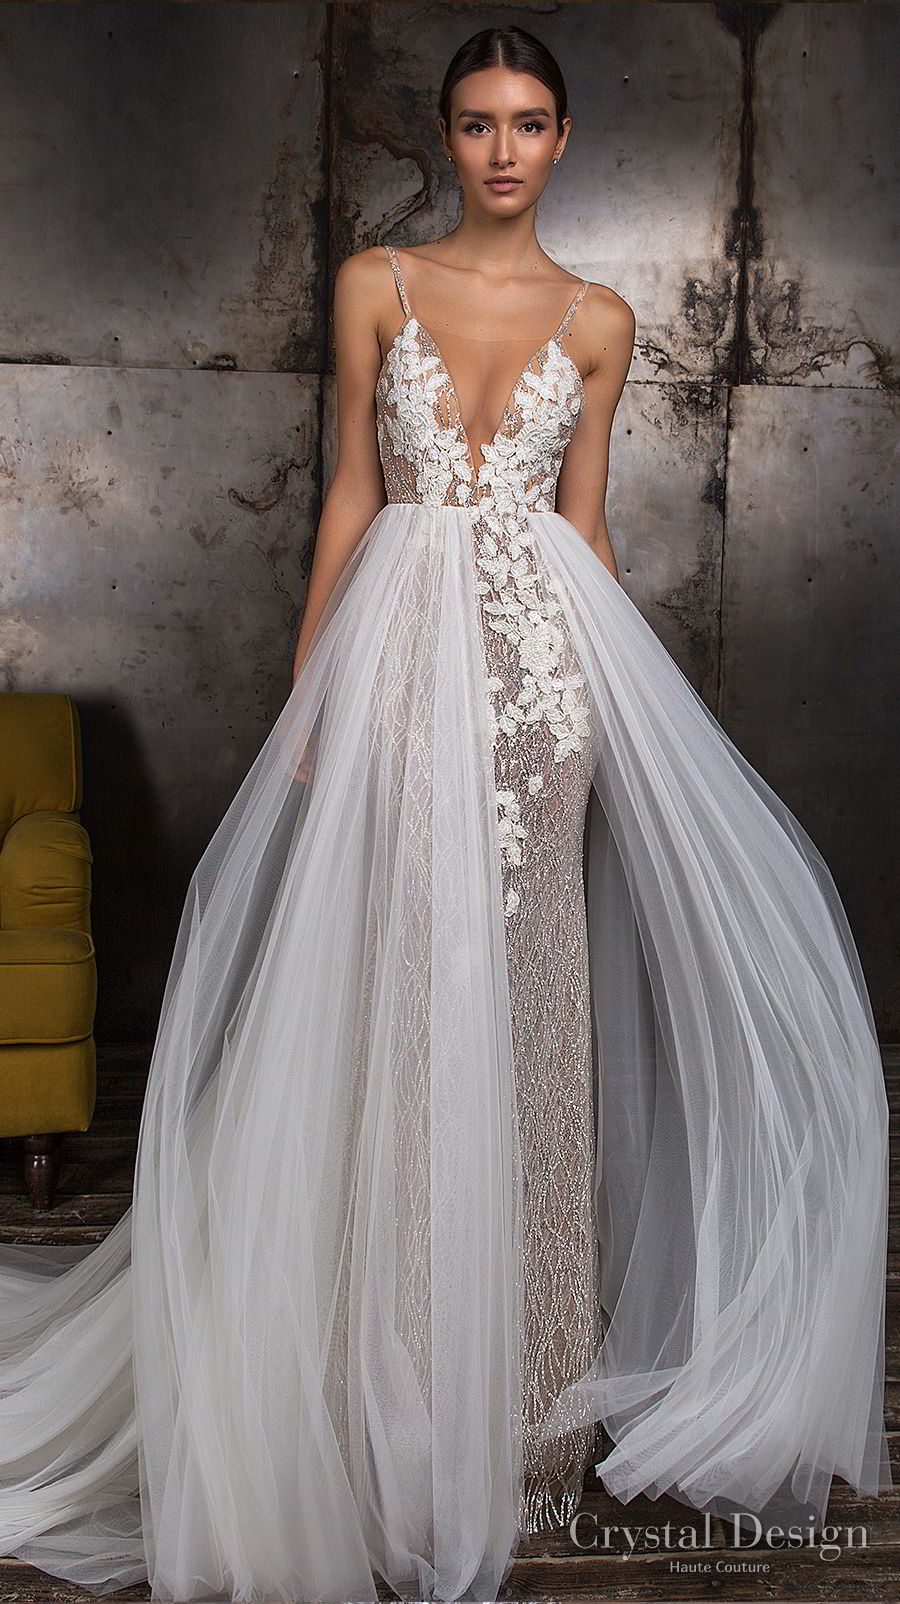 crystal design 2018 sleeveless thin strap deep v neck heavily embellished bodice romantic sheath wedding dress a line overskirt chapel train open back (magic) mv